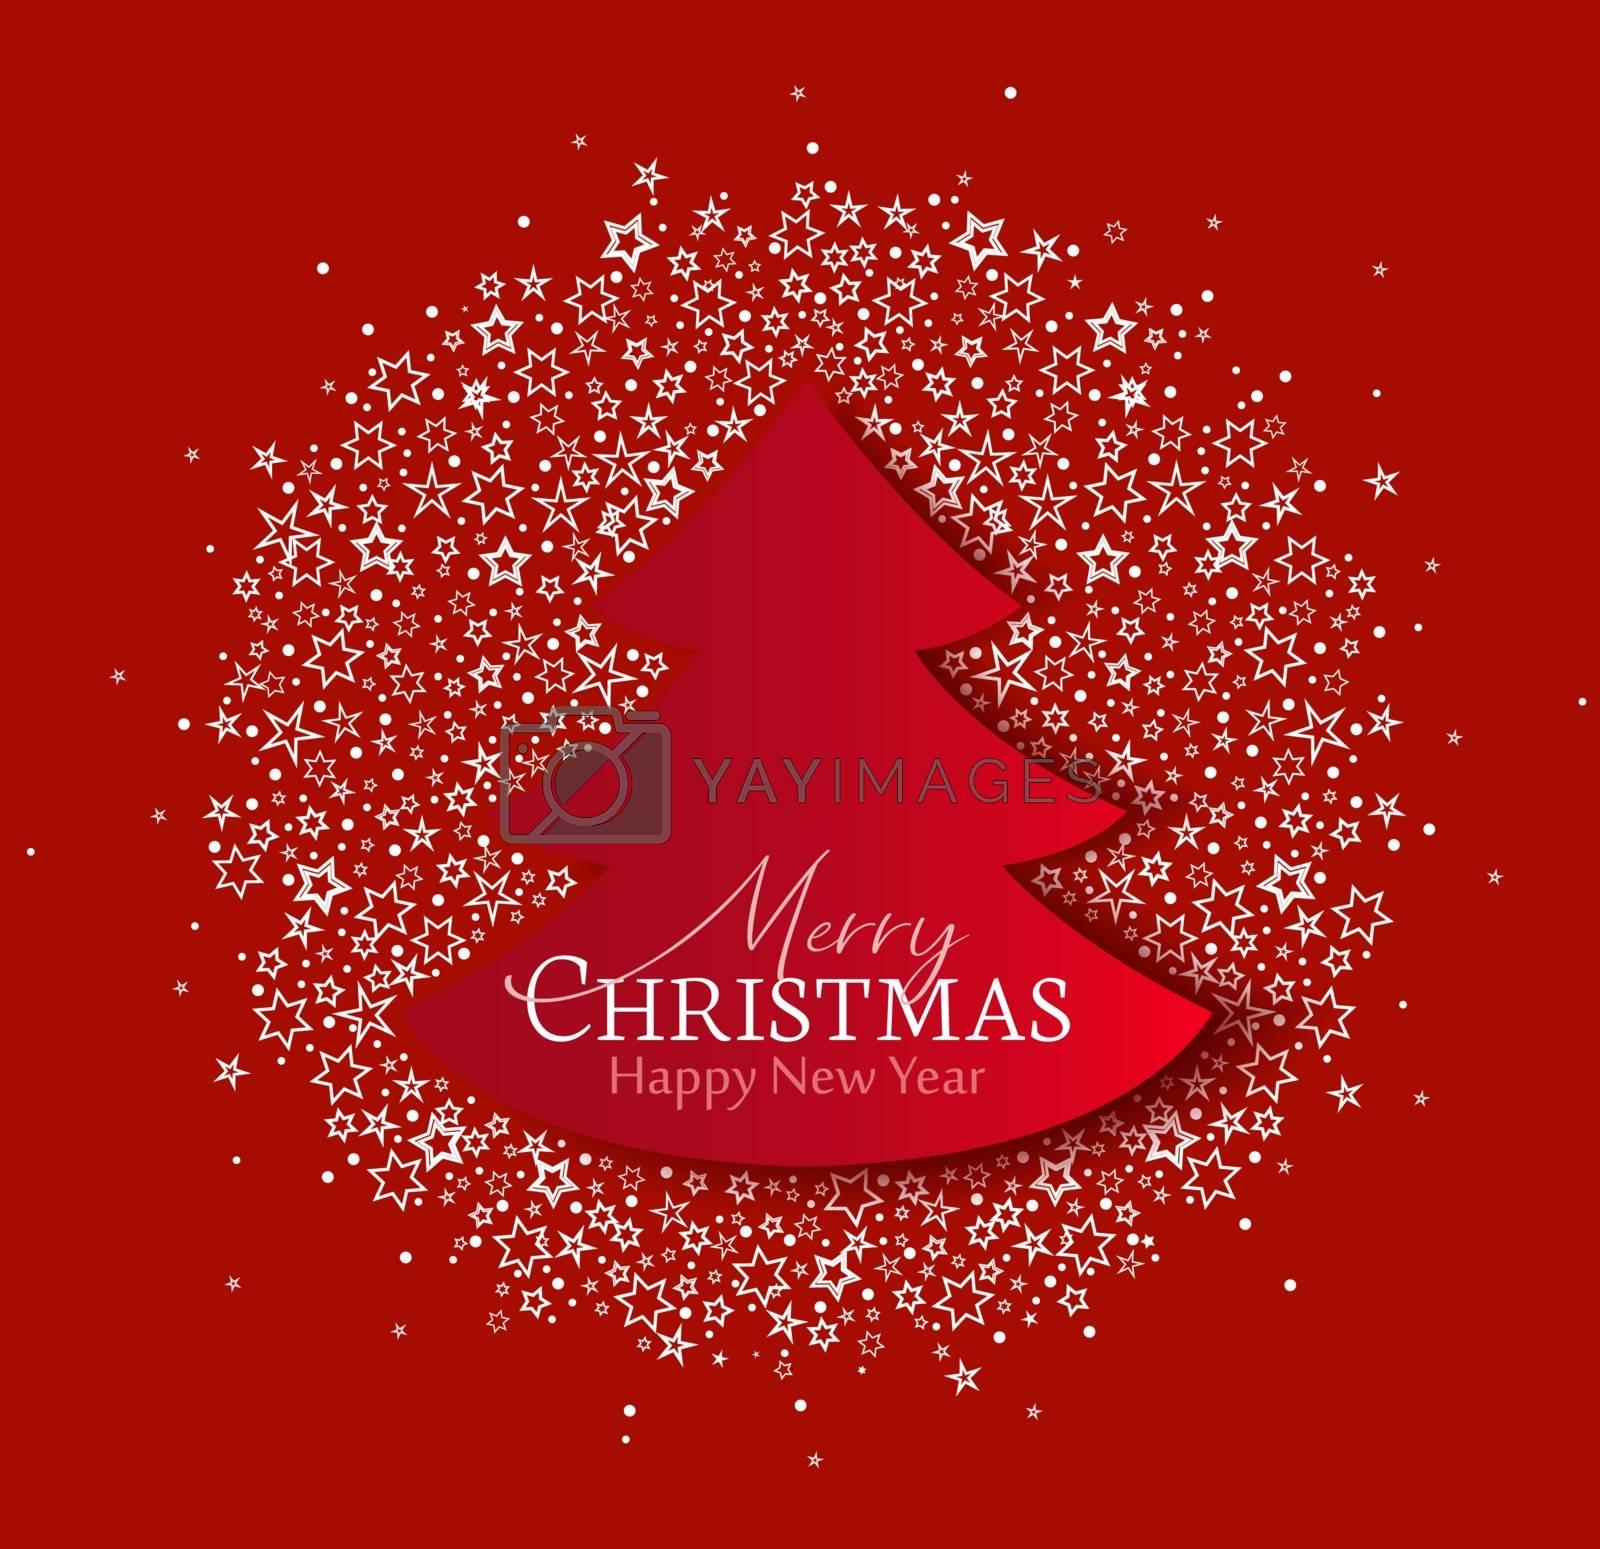 Royalty free image of Christmas tree decoration by odina222